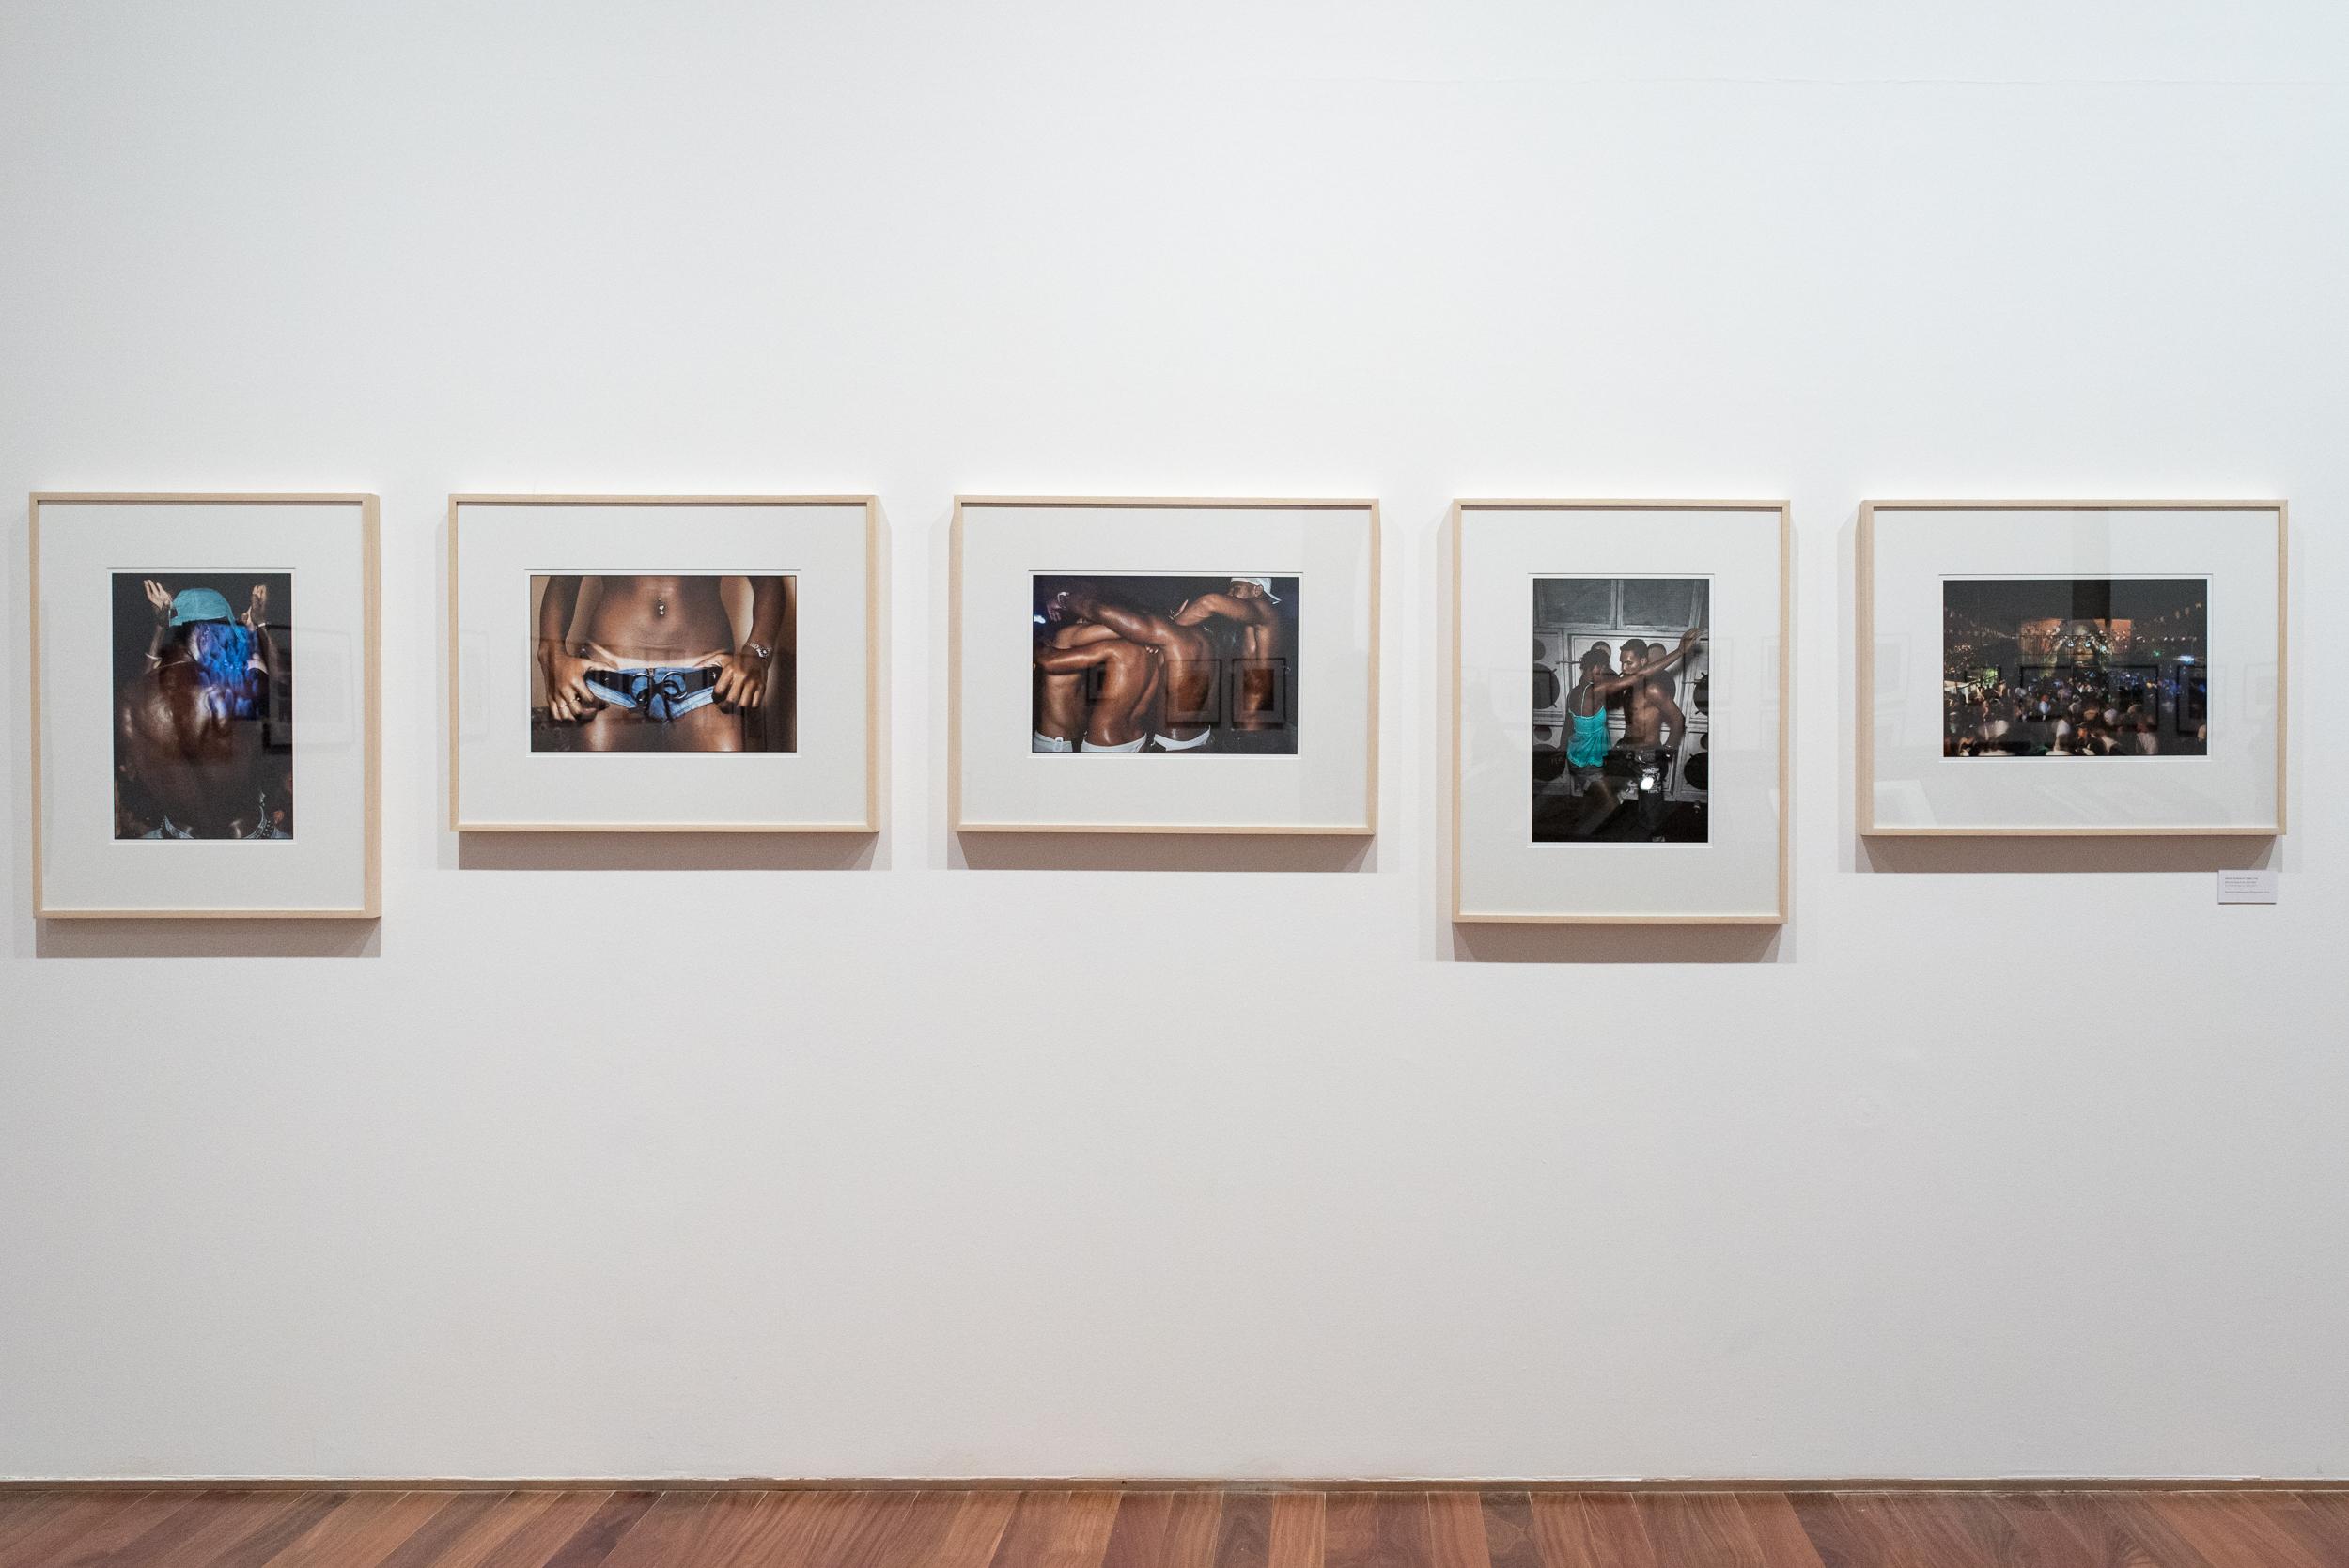 "Rio - Uma Paixão Francesa - ""Rio - a French Passion"" collective exhibit at the Museum of Art of Rio de Janeiro (MAR) - participation of Vincent Rosenblatt with 5 images from the ""Rio Baile Funk"" serie."